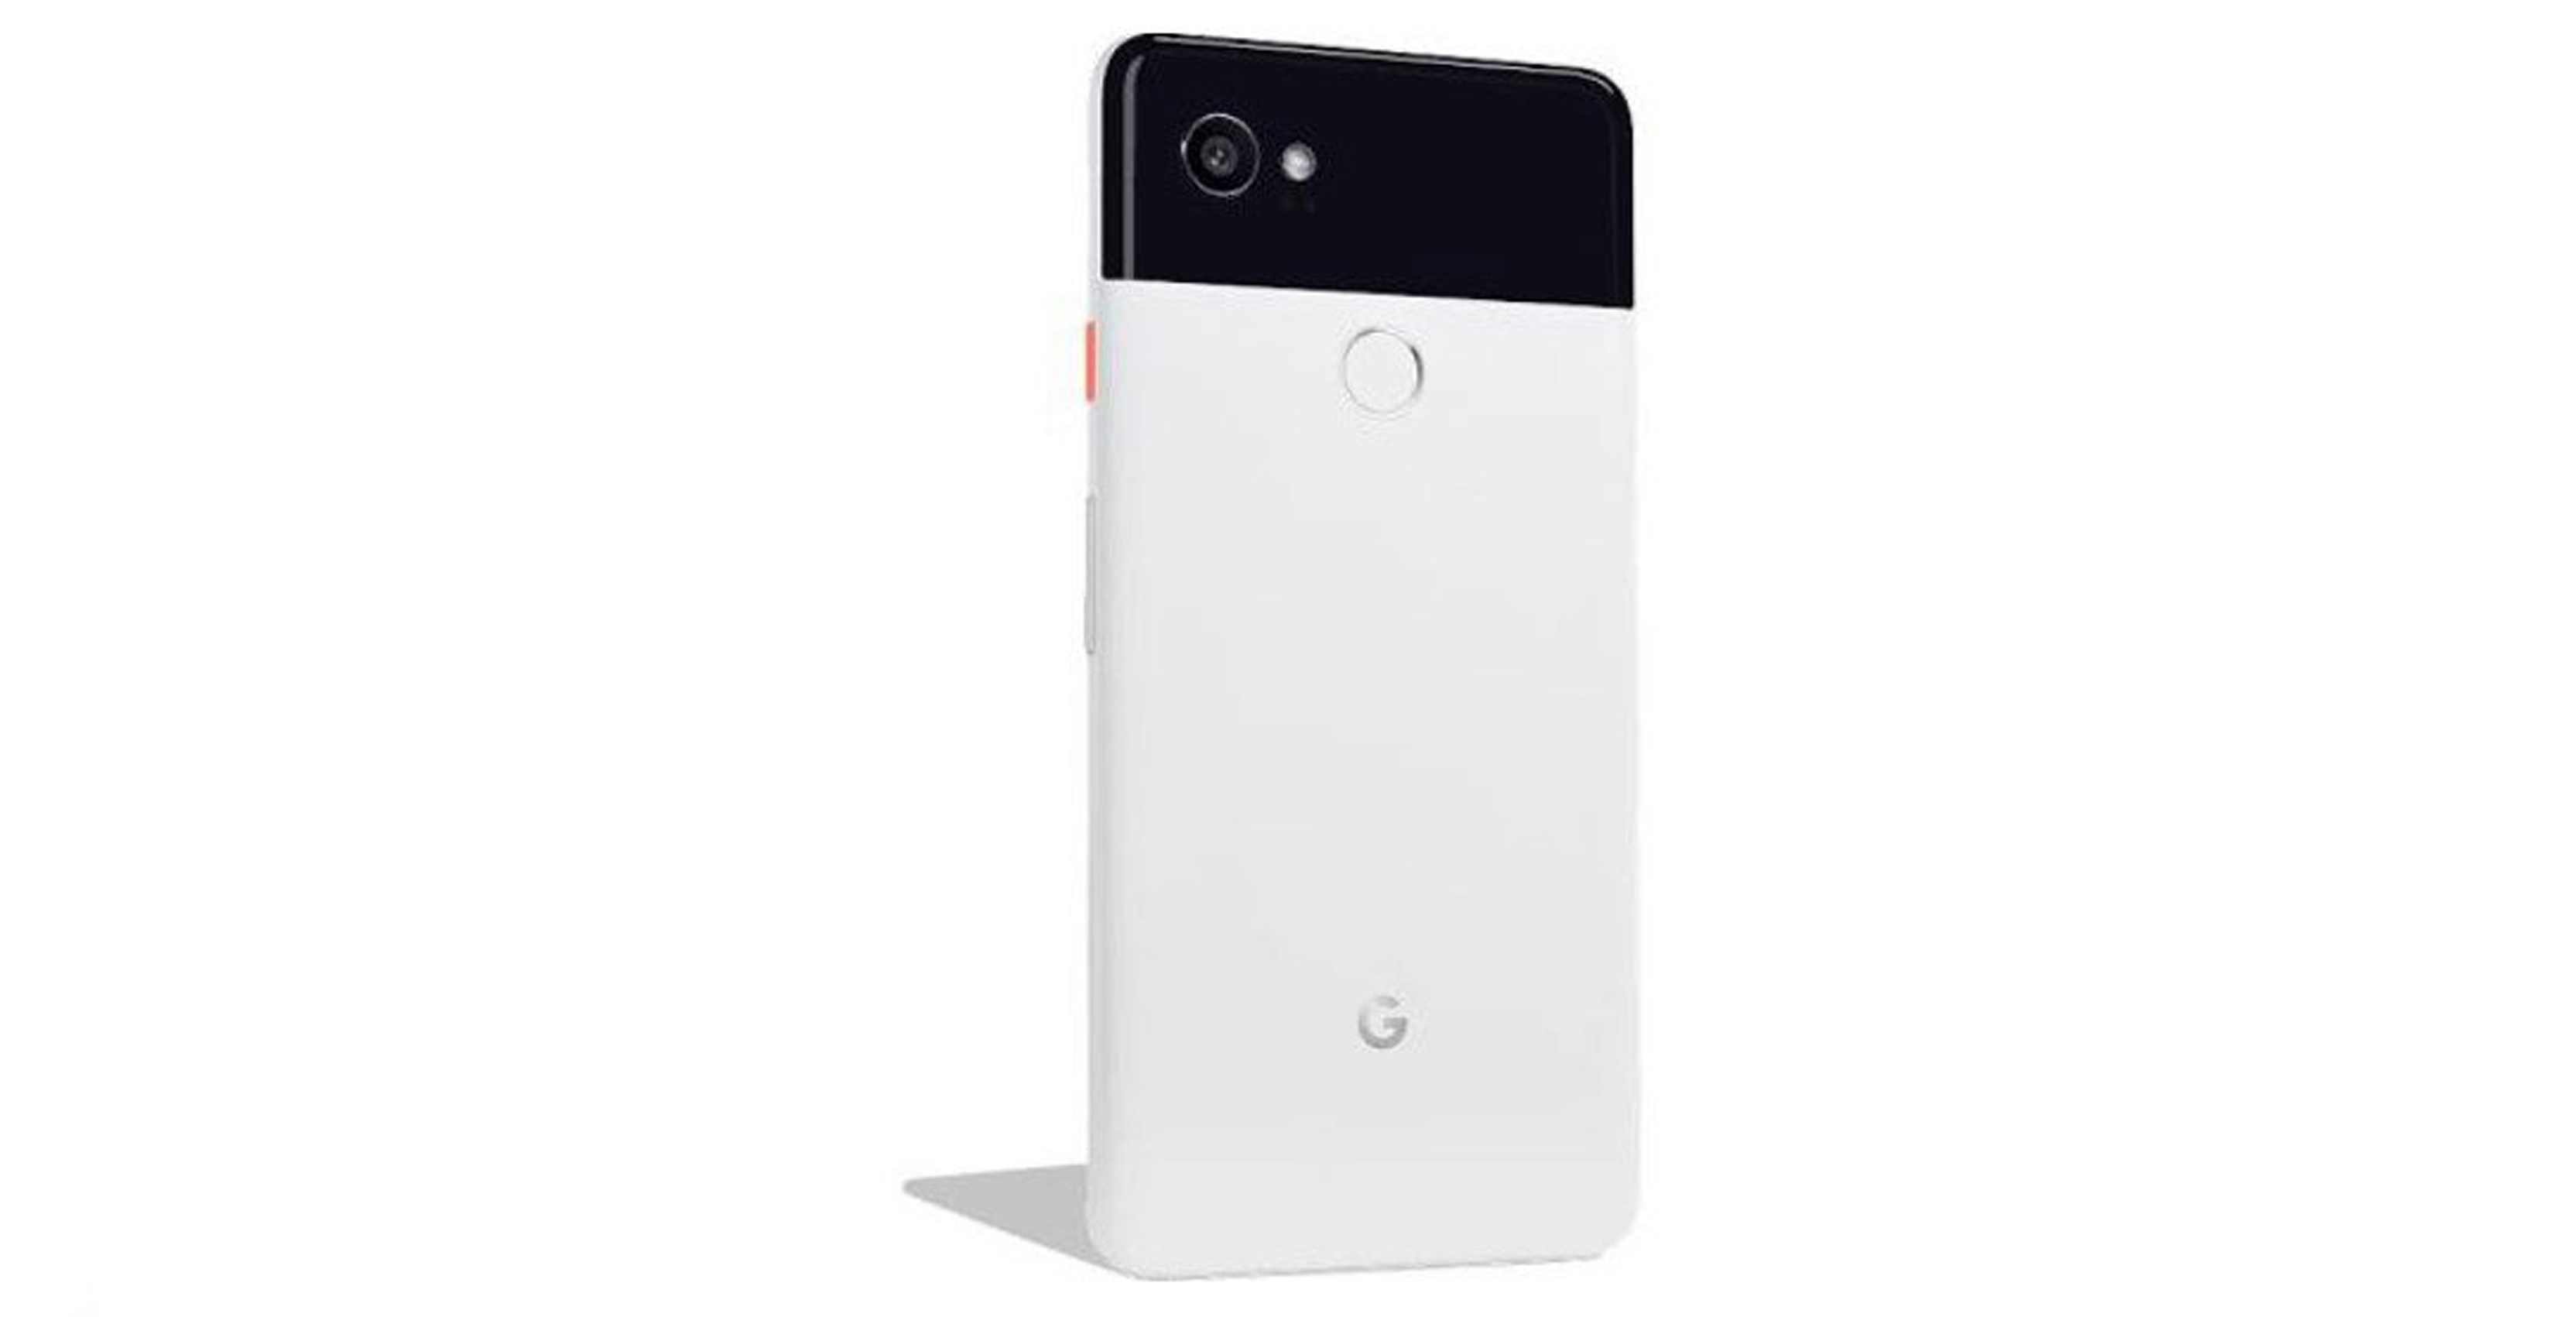 Pixel 2 XL leaked